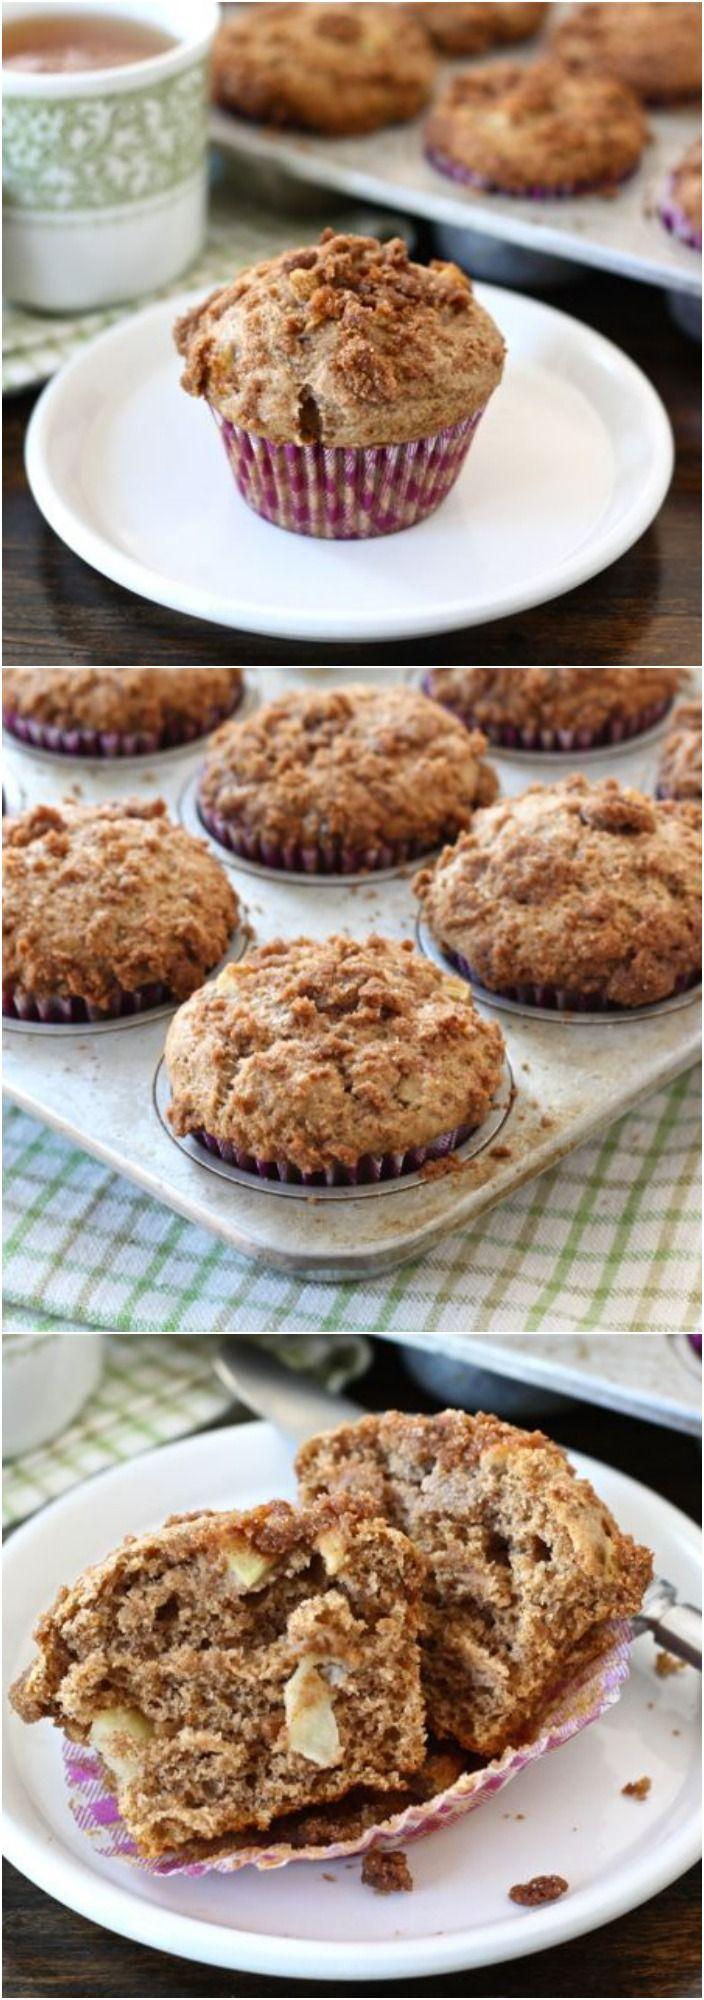 Apple Cinnamon Crumb Muffins on twopeasandtheirpod.com Love these easy fall muffins! #recipe #apple